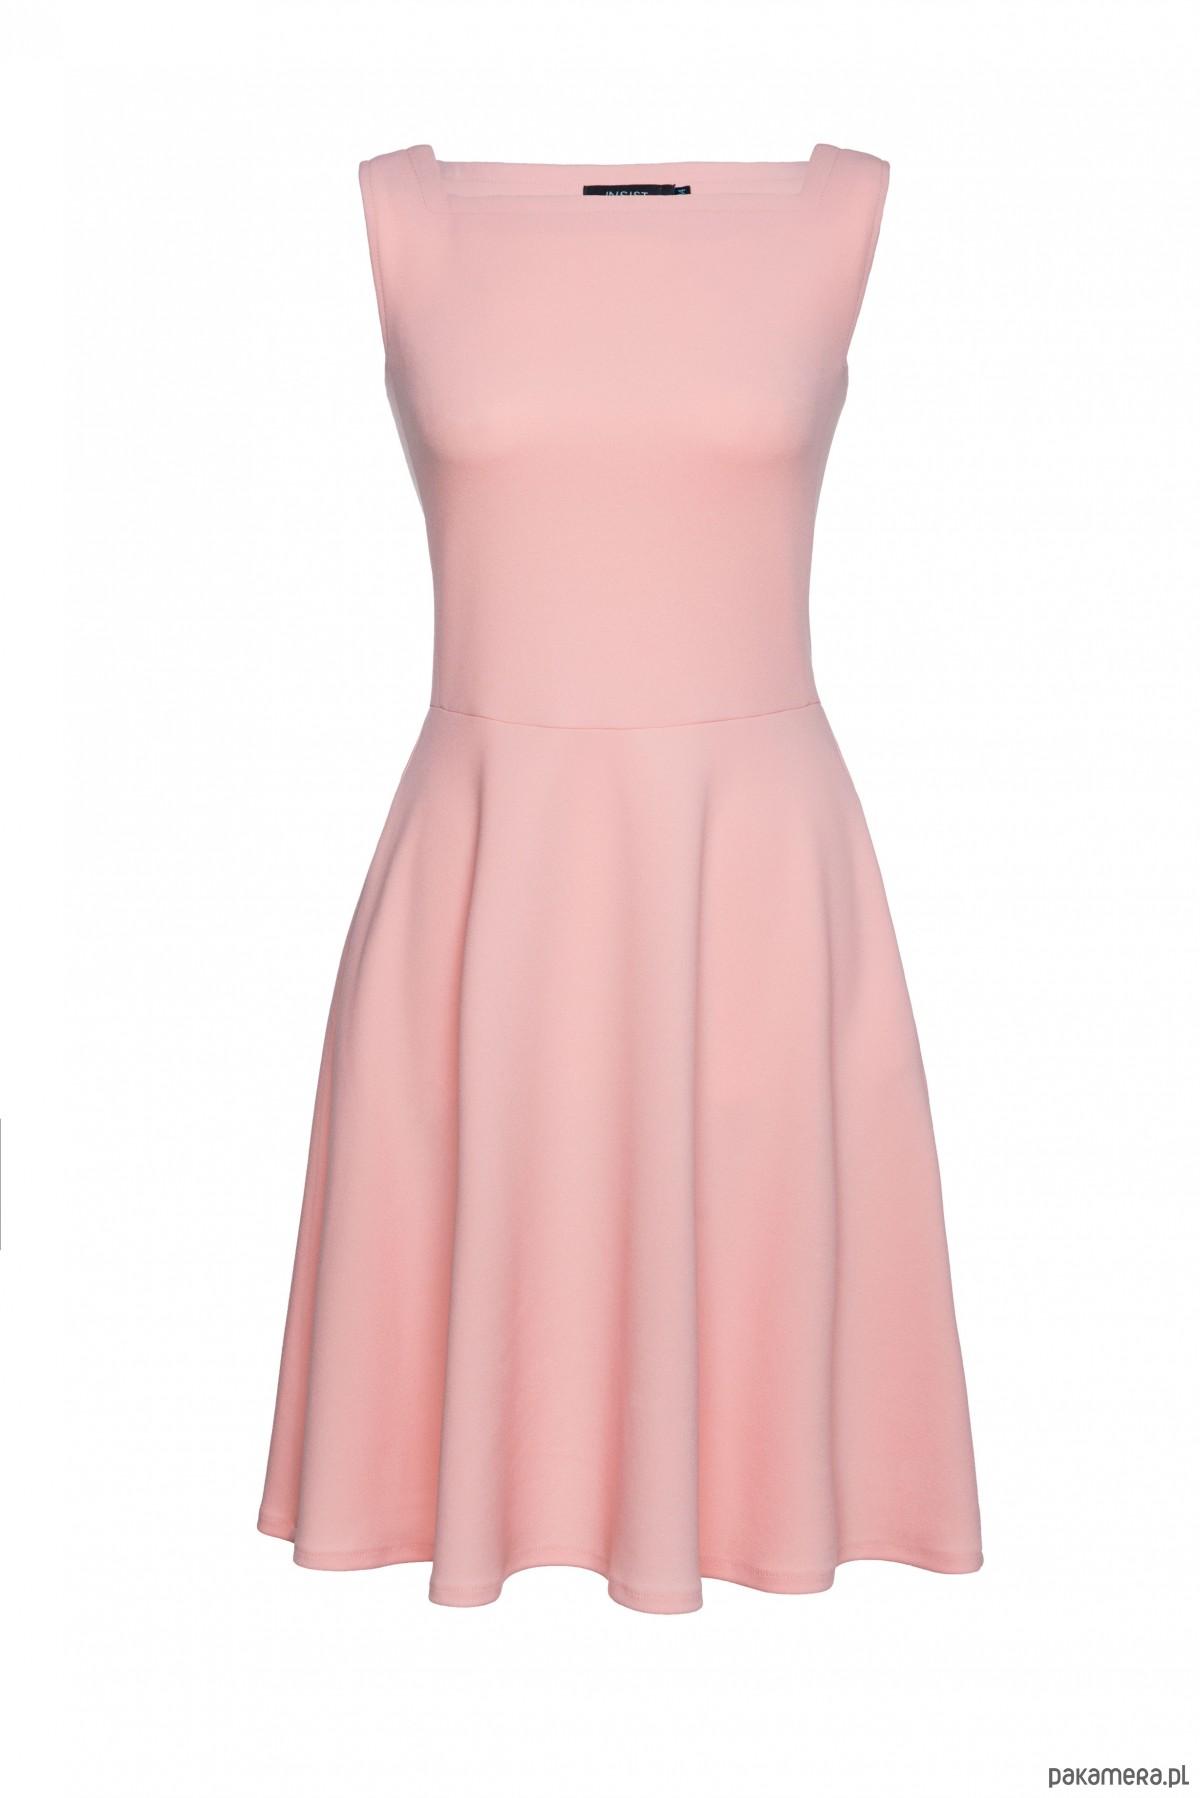 9f118ea8ab Sukienka rozkloszowana pudrowa różowa - sukienki - midi - Pakamera.pl